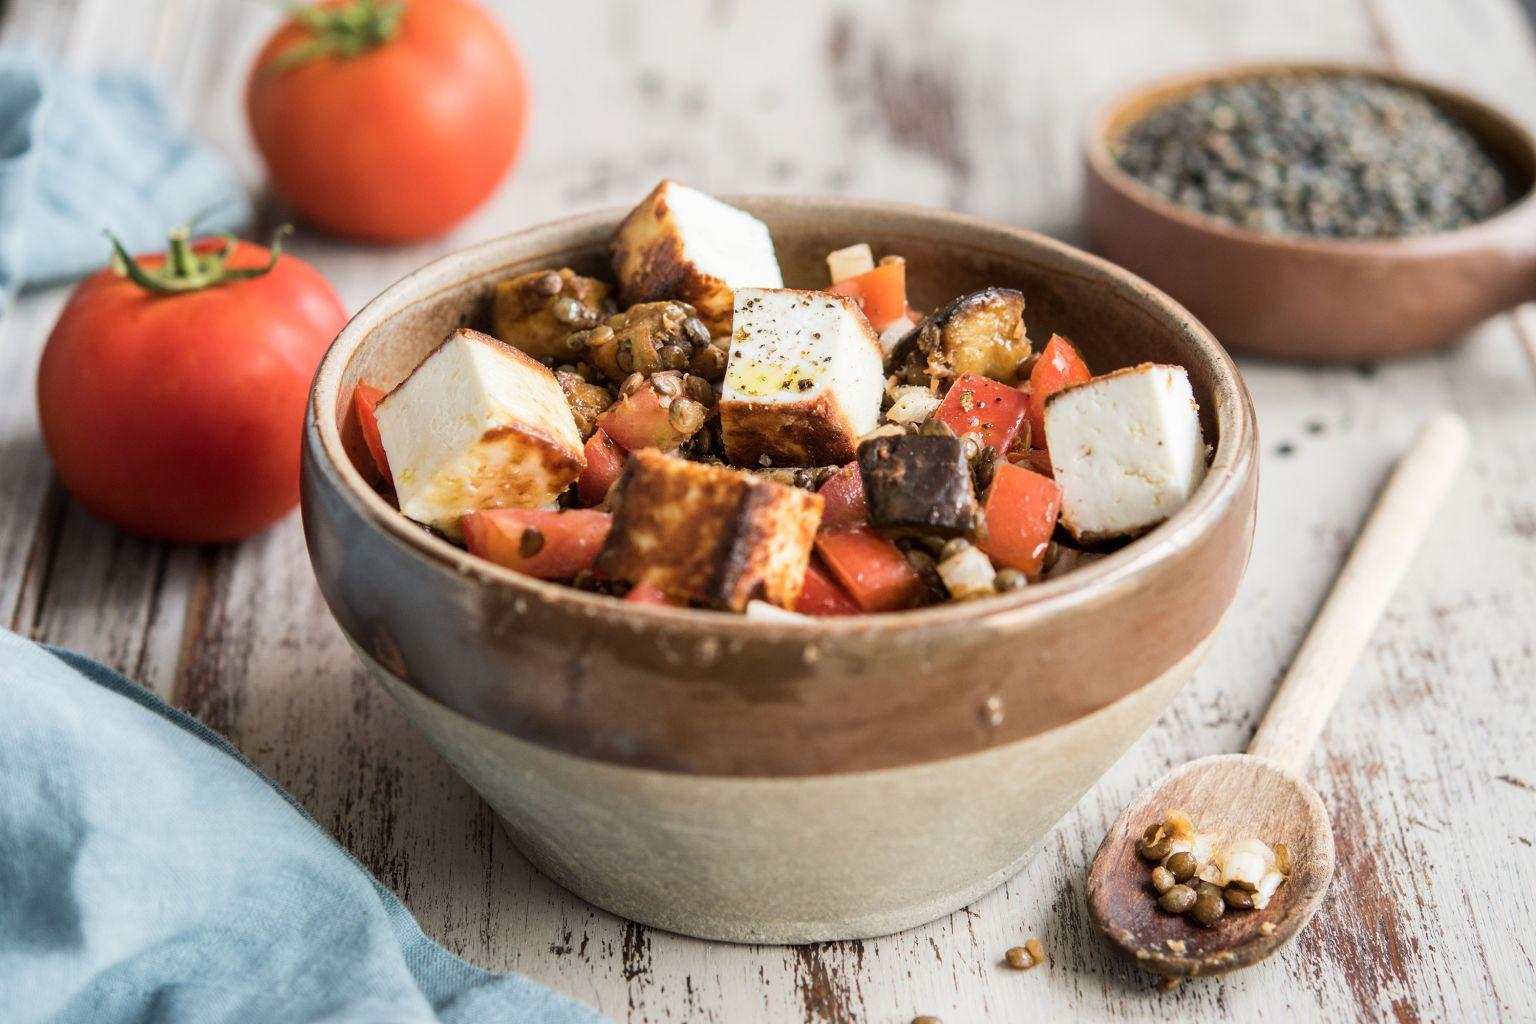 Salade de lentilles tikka masala et manouri façon paneer